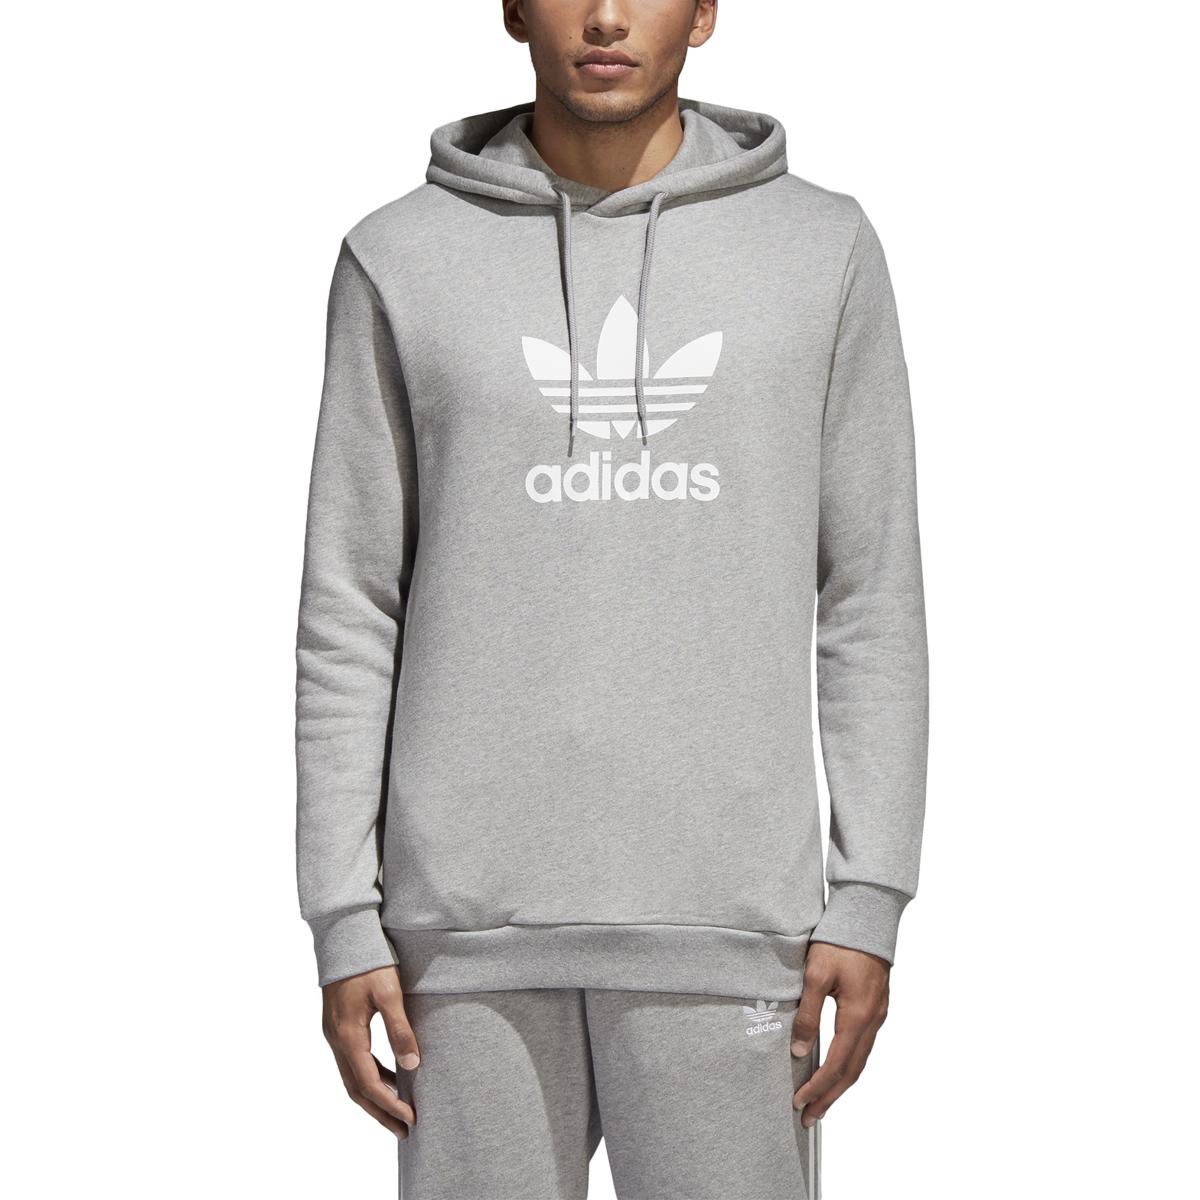 adidas Trefoil Hoodie Trainingsanzug Blau | adidas Deutschland